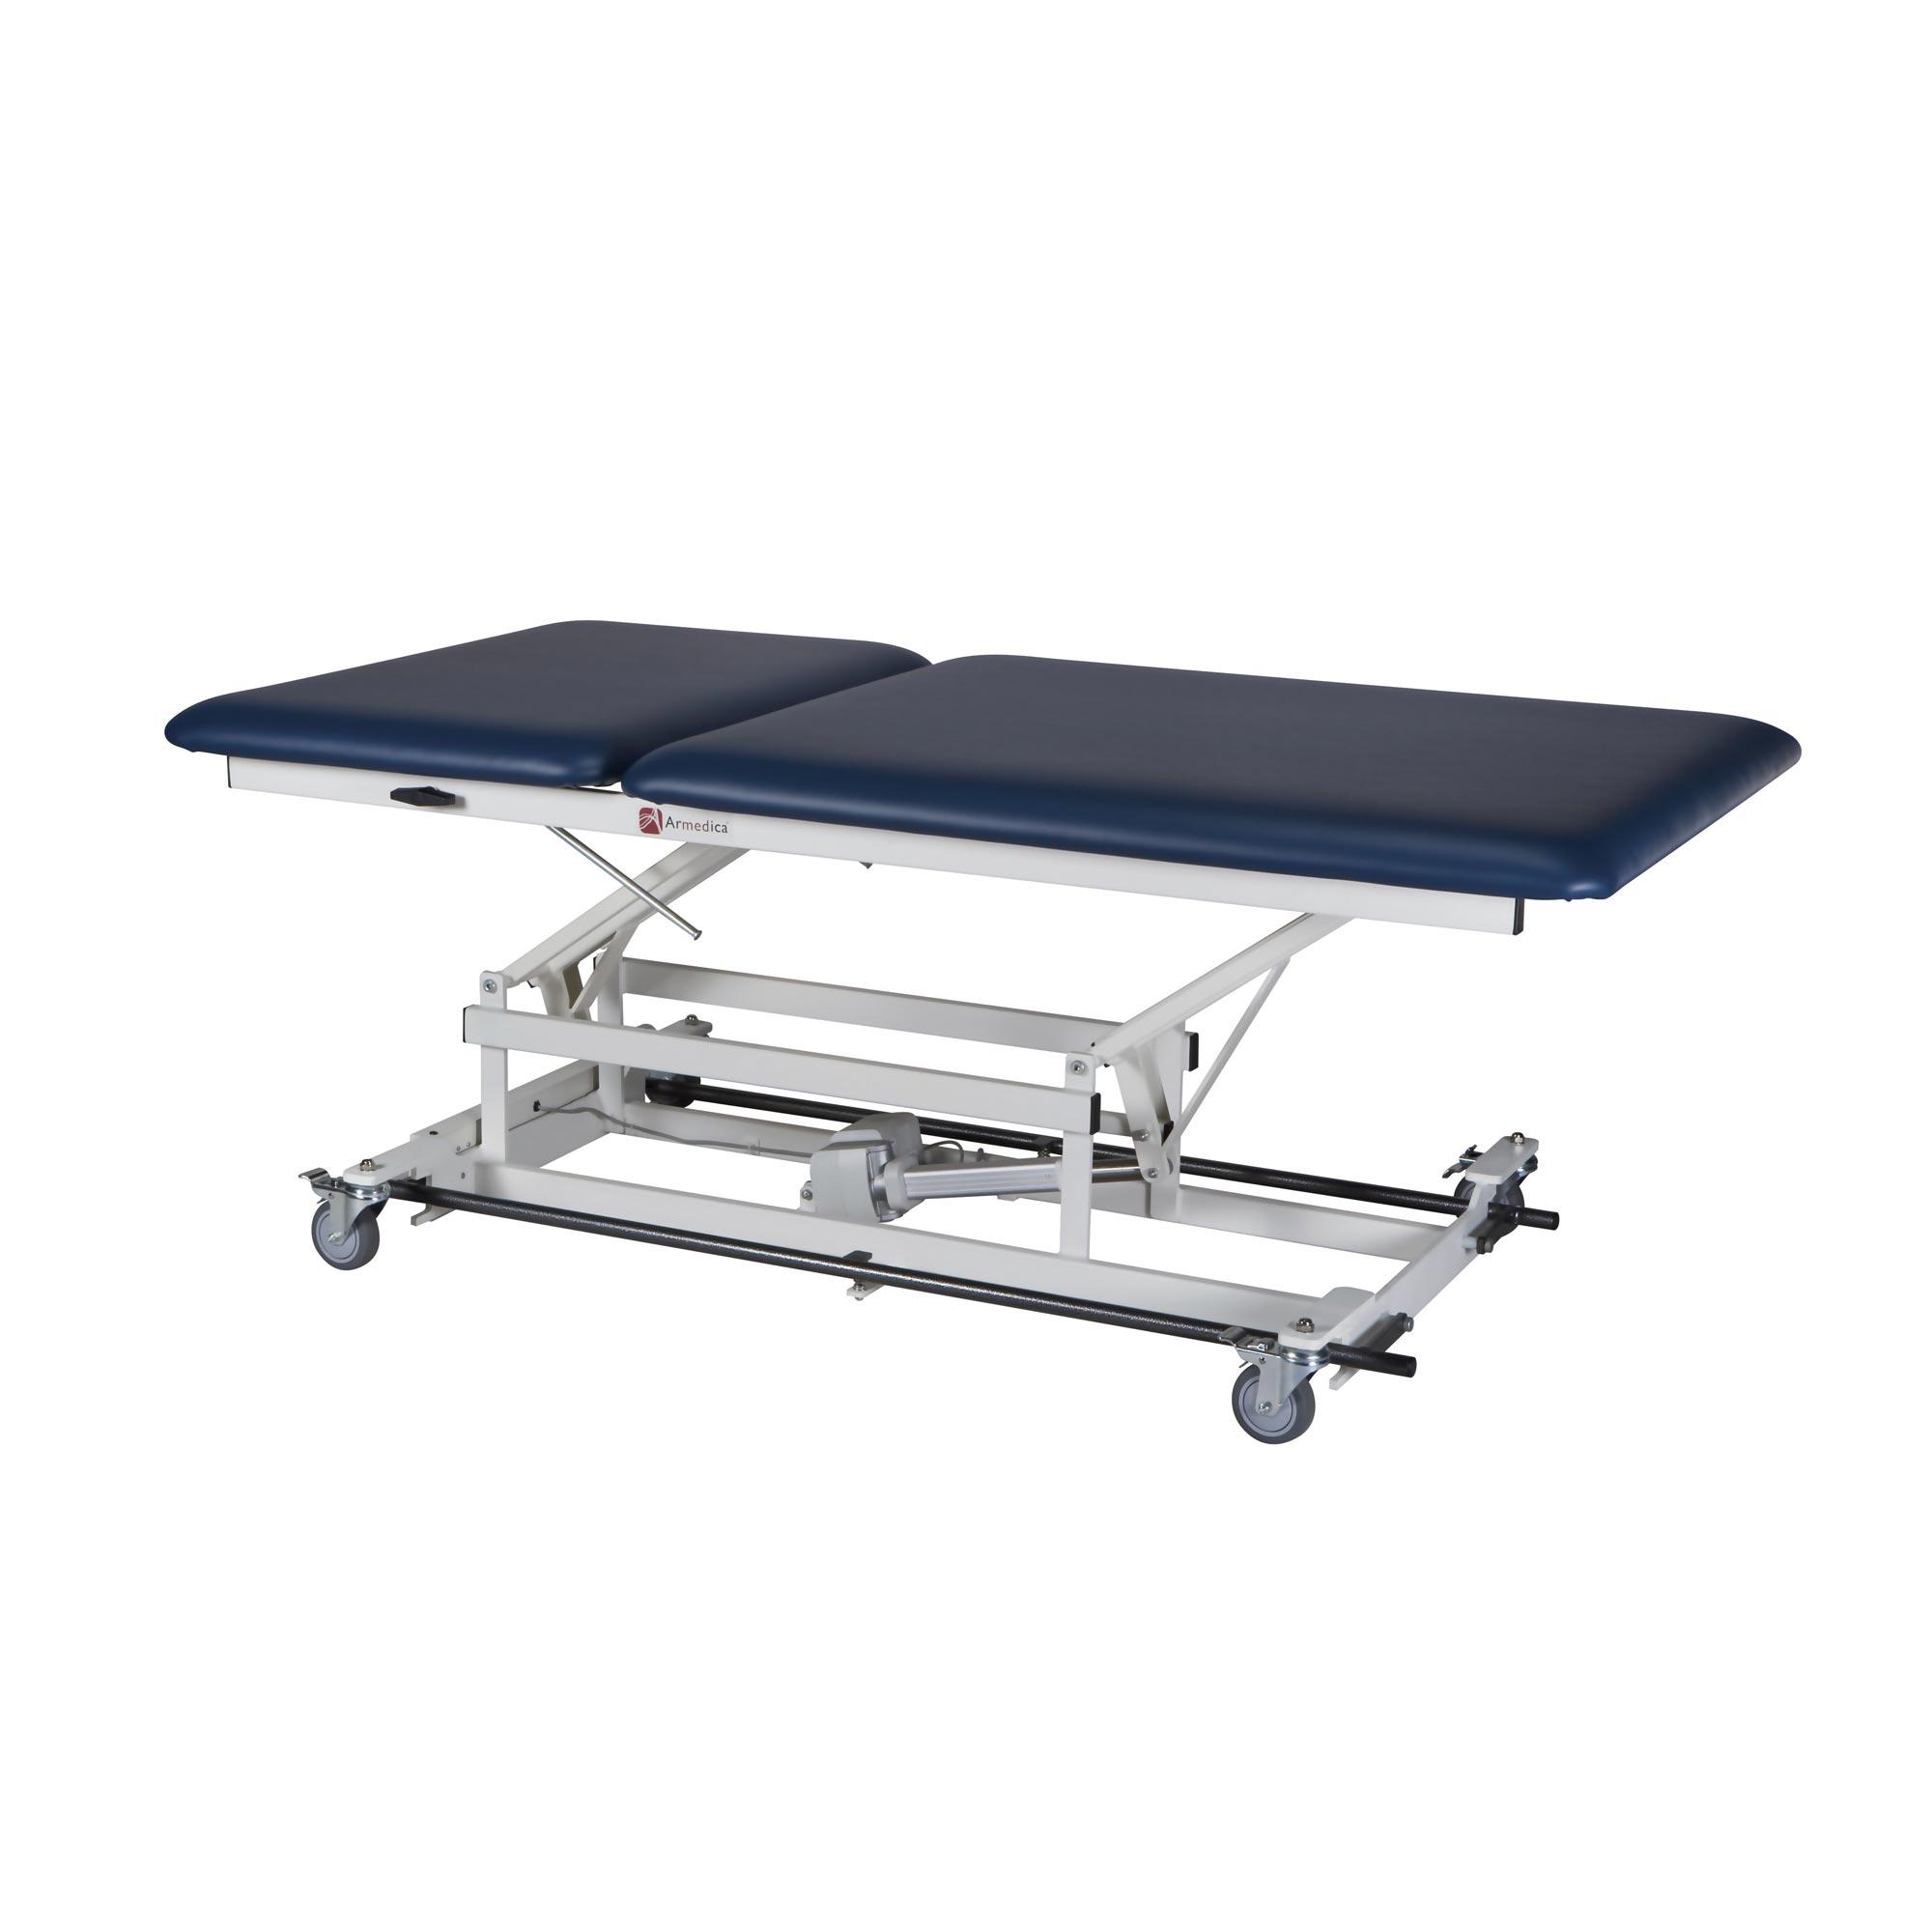 Armedica AM-BA 240 treatment table